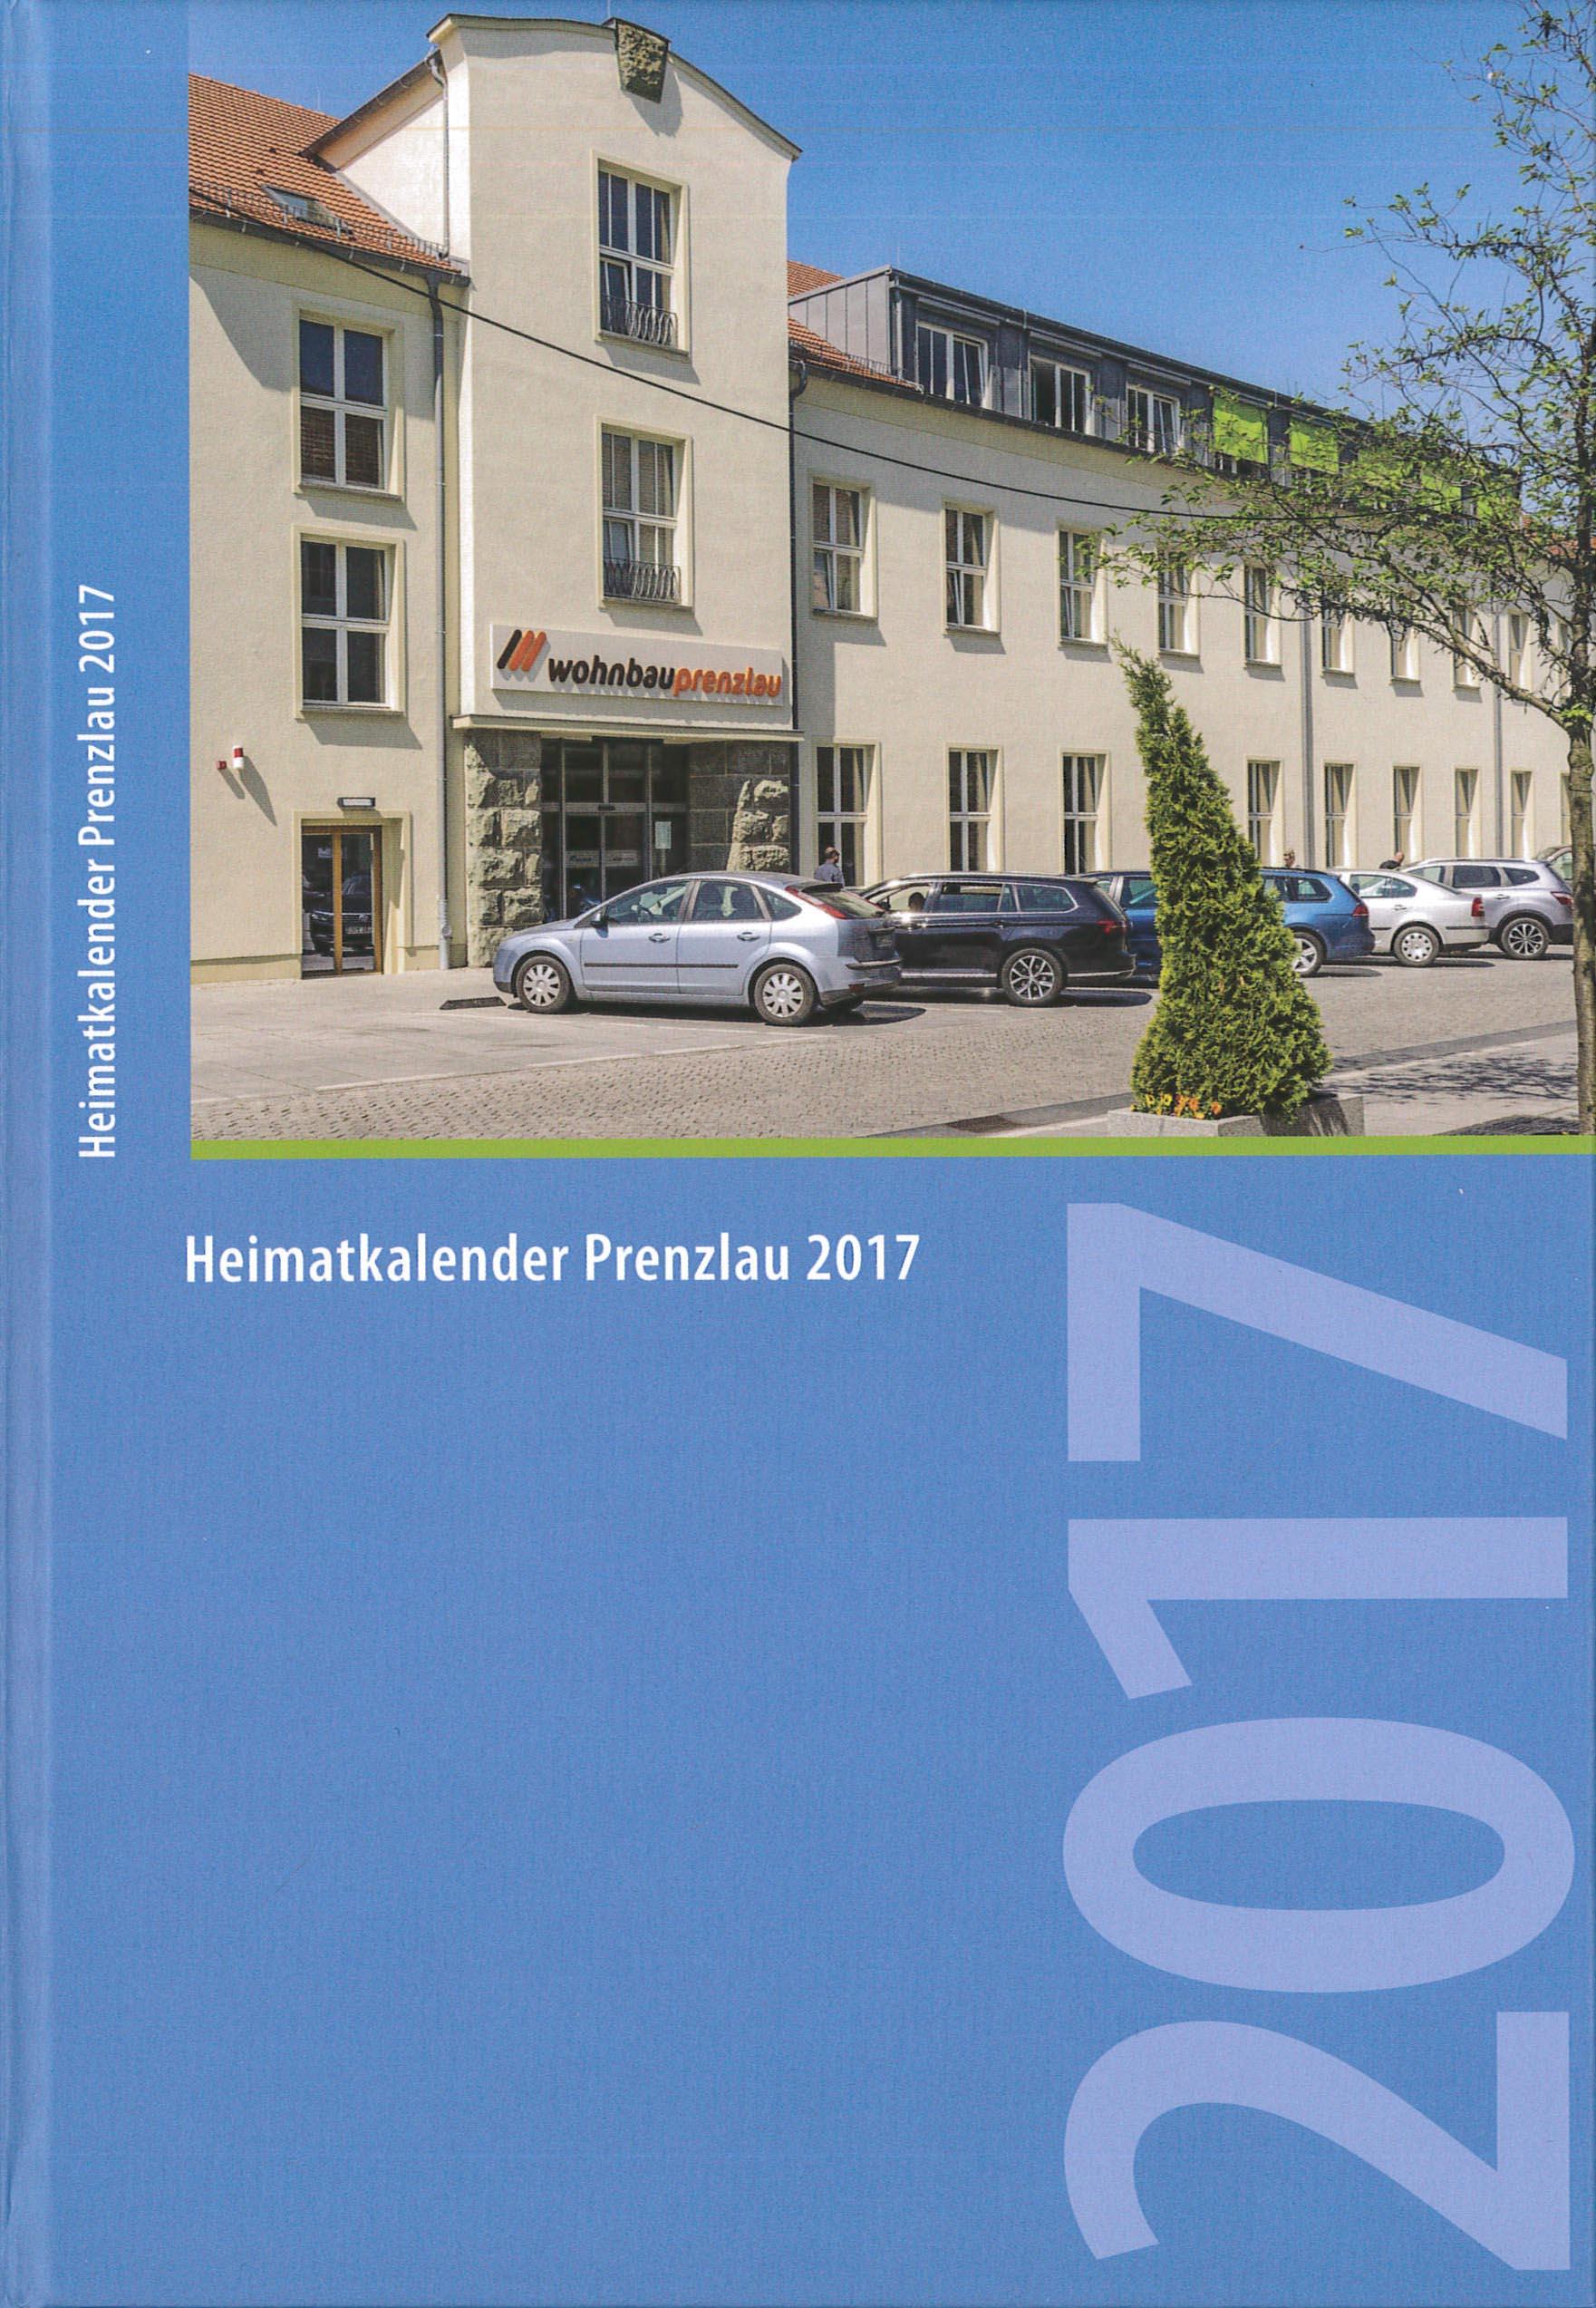 Heimatkalender Prenzlau 2017. (2016)